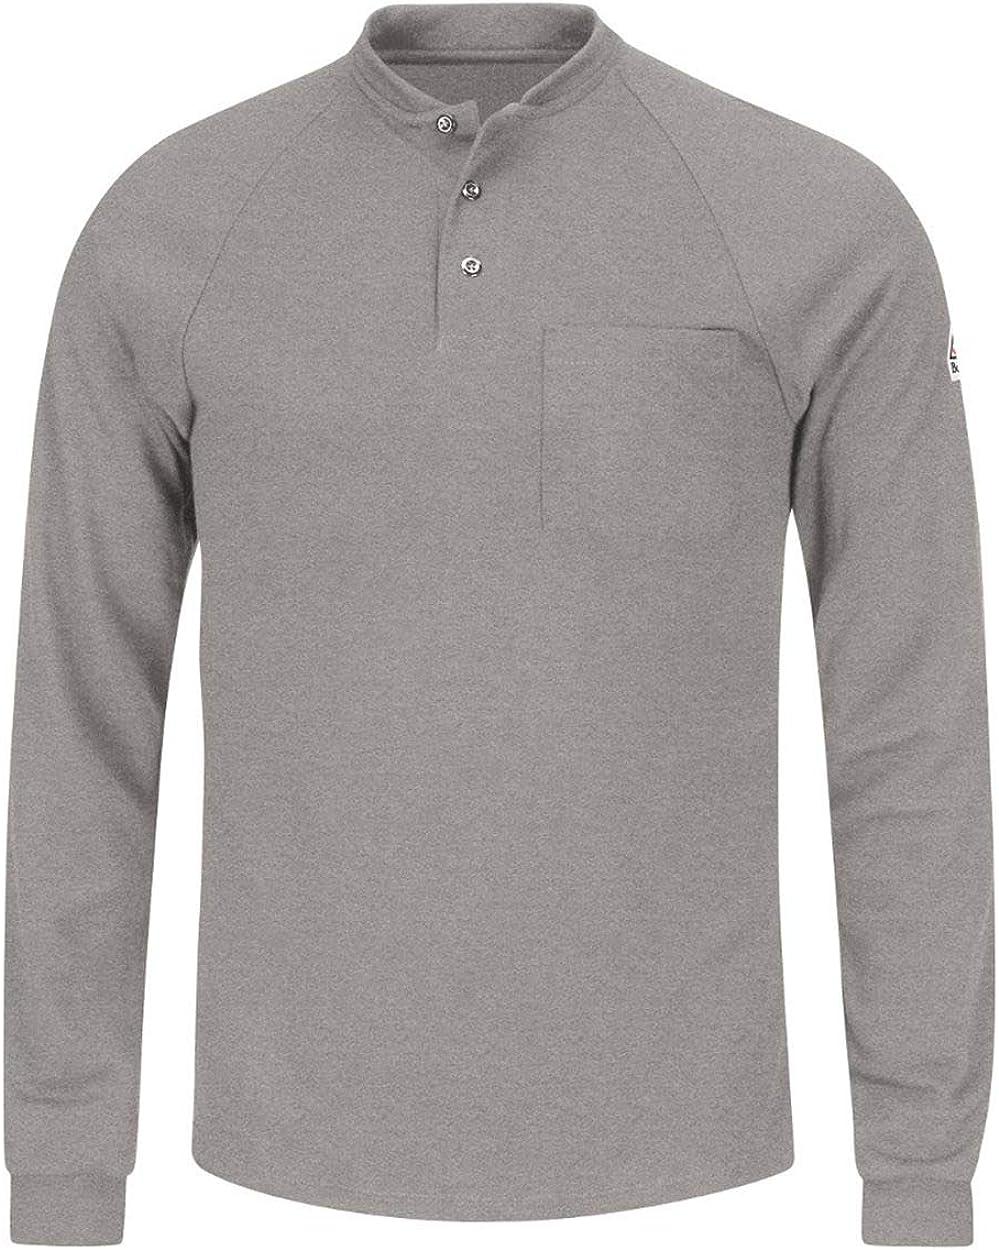 Men's Bulwark FR Long Sleeve Henley Shirt - CoolTouch2 6.5 oz Grey